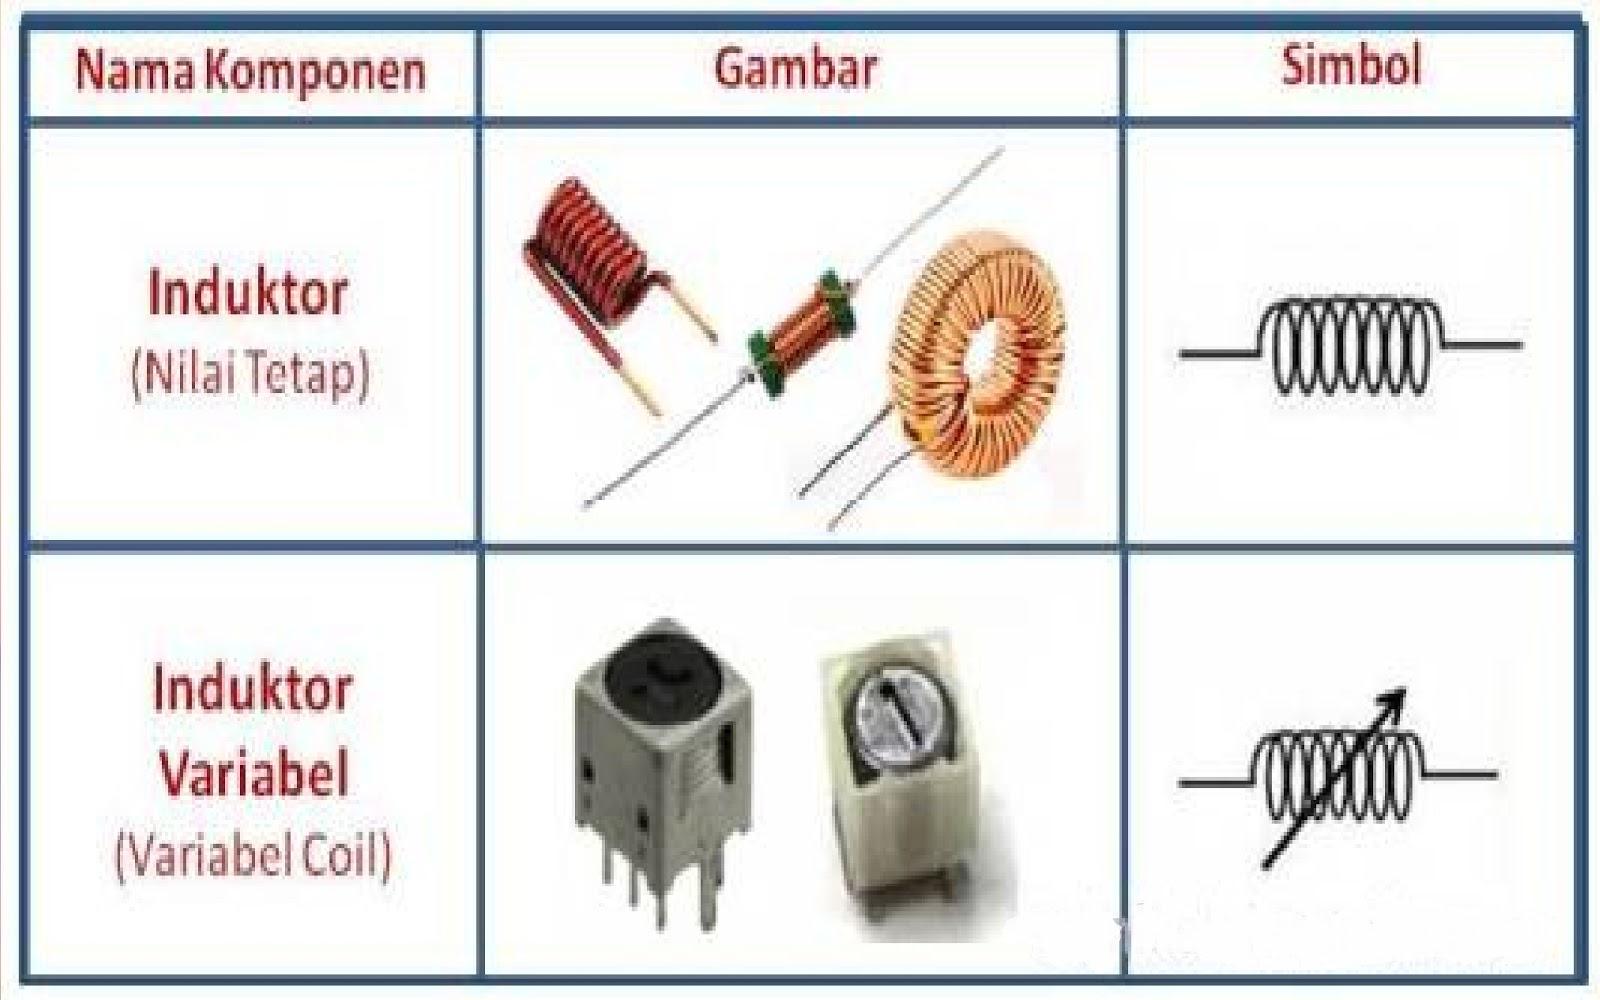 komponen elektronika pasif induktor